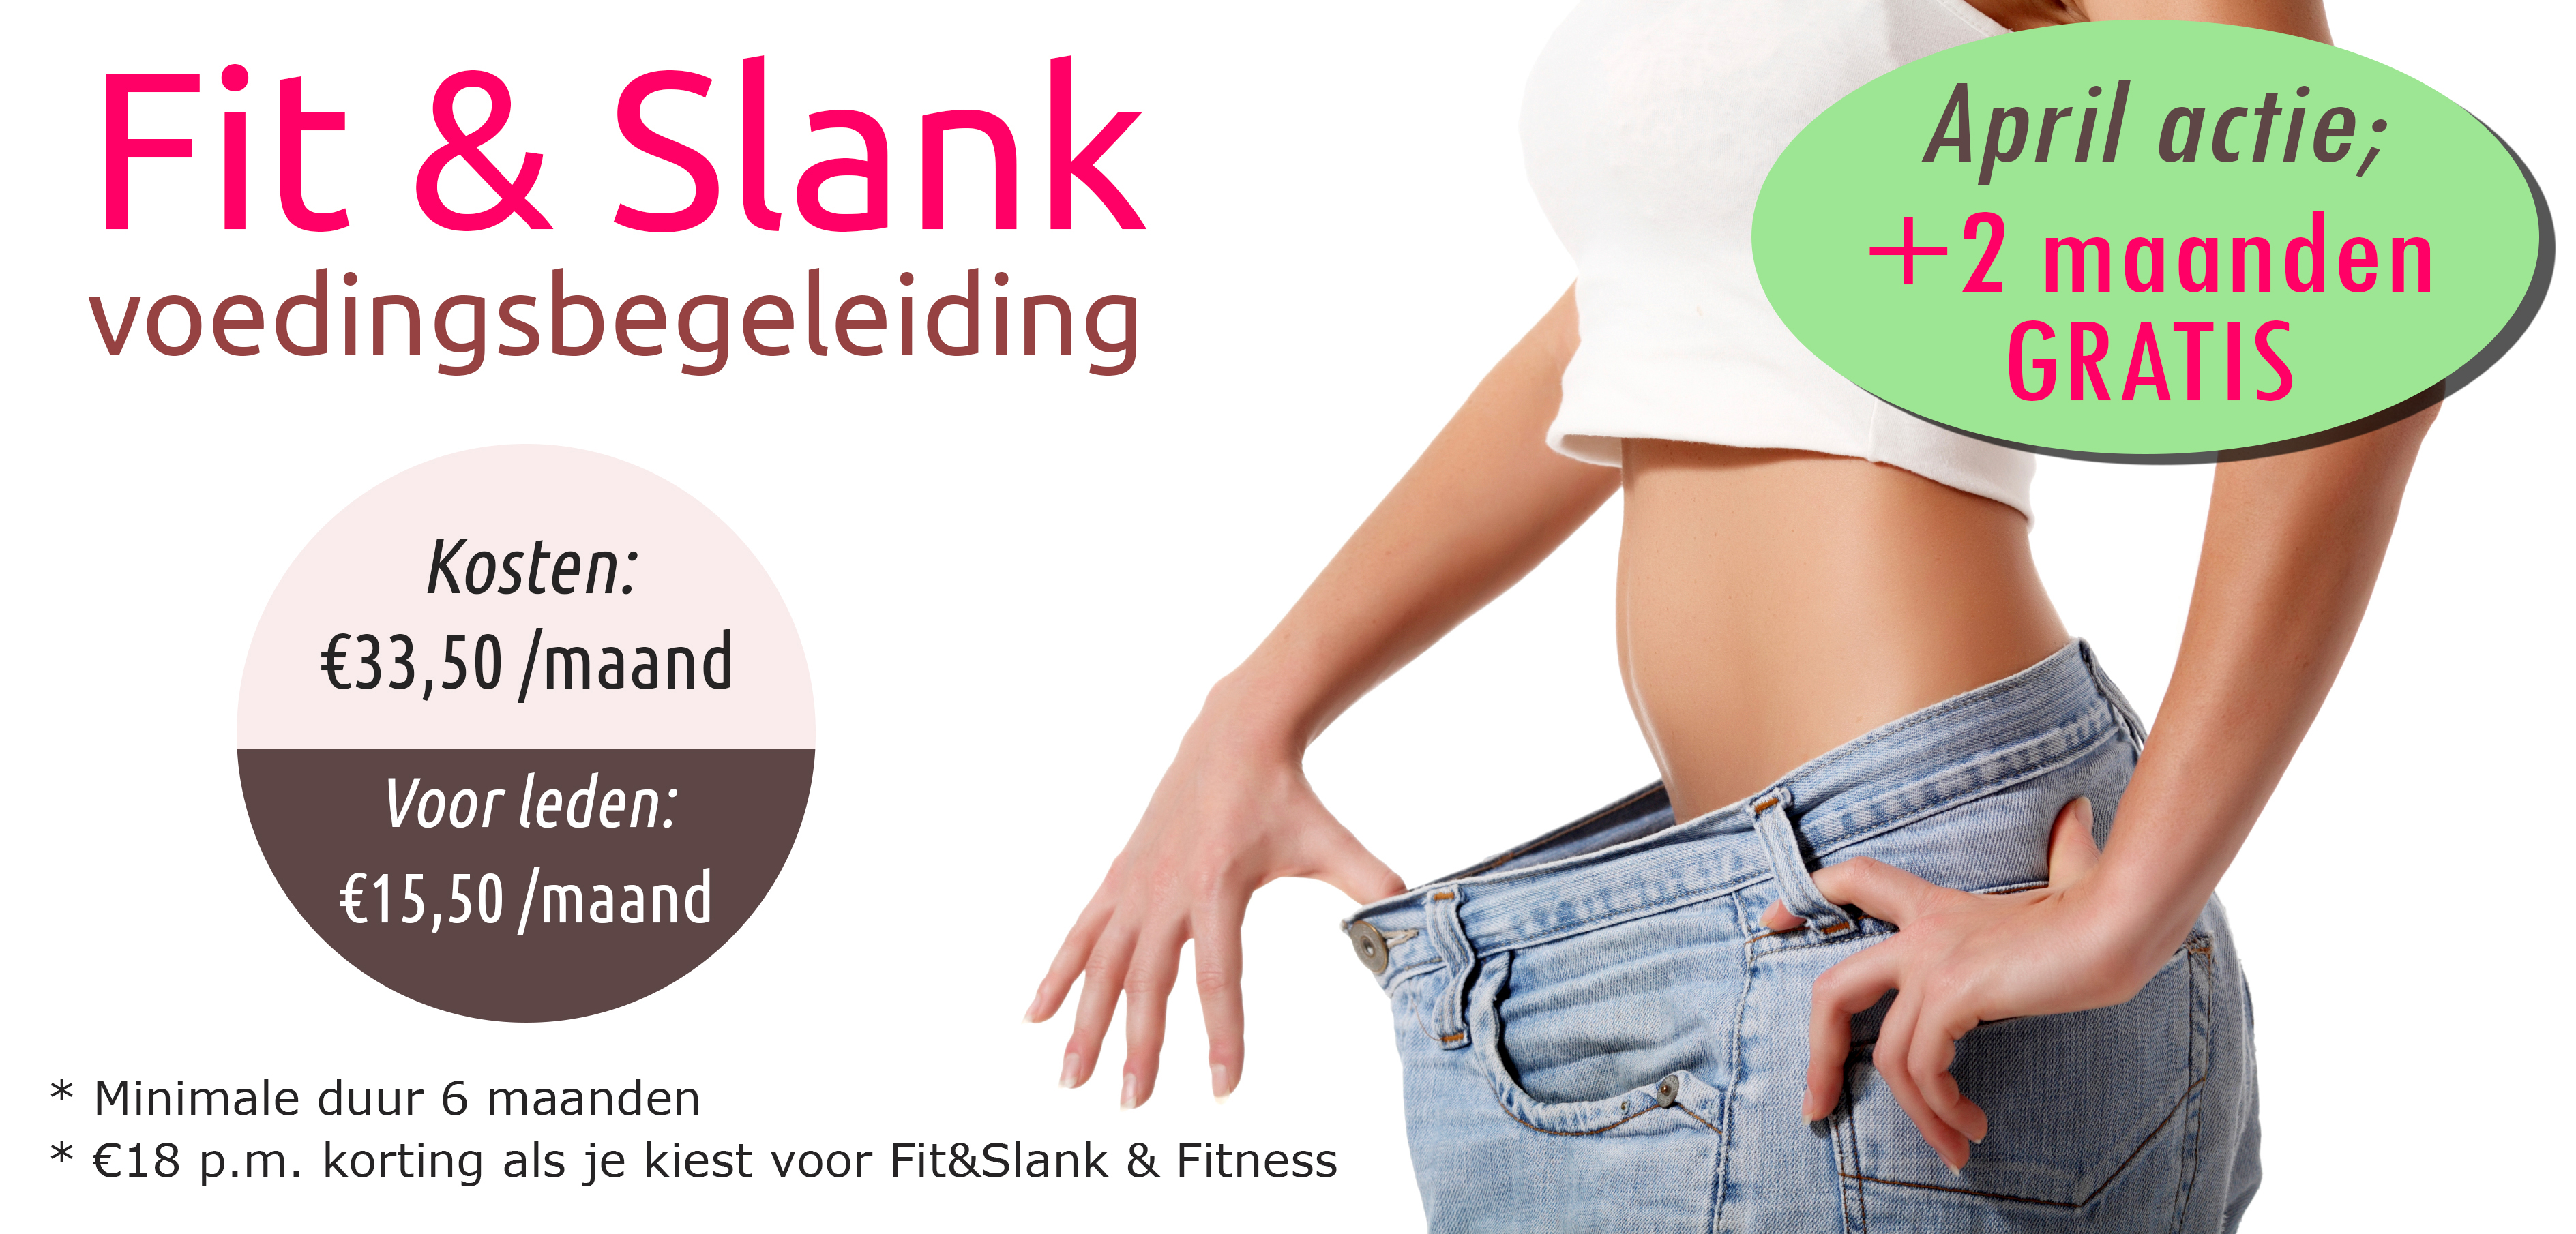 Fit&Slank voedingsbegeleiding - april +2 maanden gratis